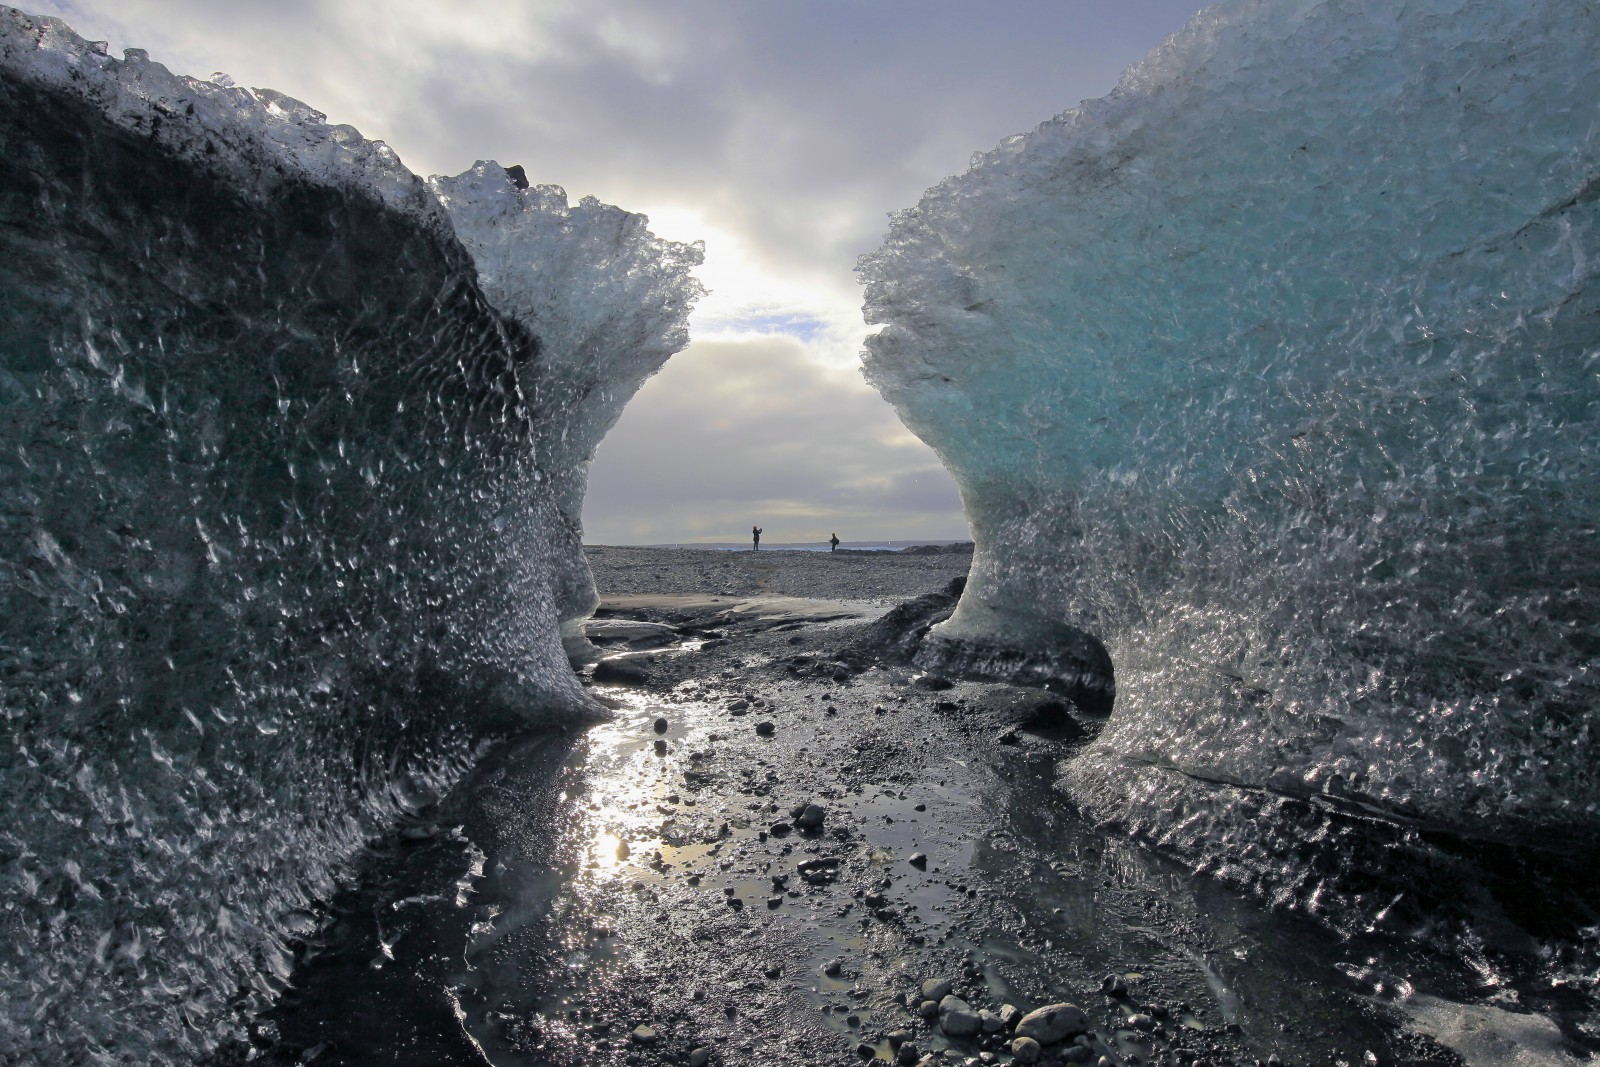 Jökulsárlón - Ice Tunnel and the lagoon. Blue Iceland - Ice Caving and Hiking - Photo: Max Schmid